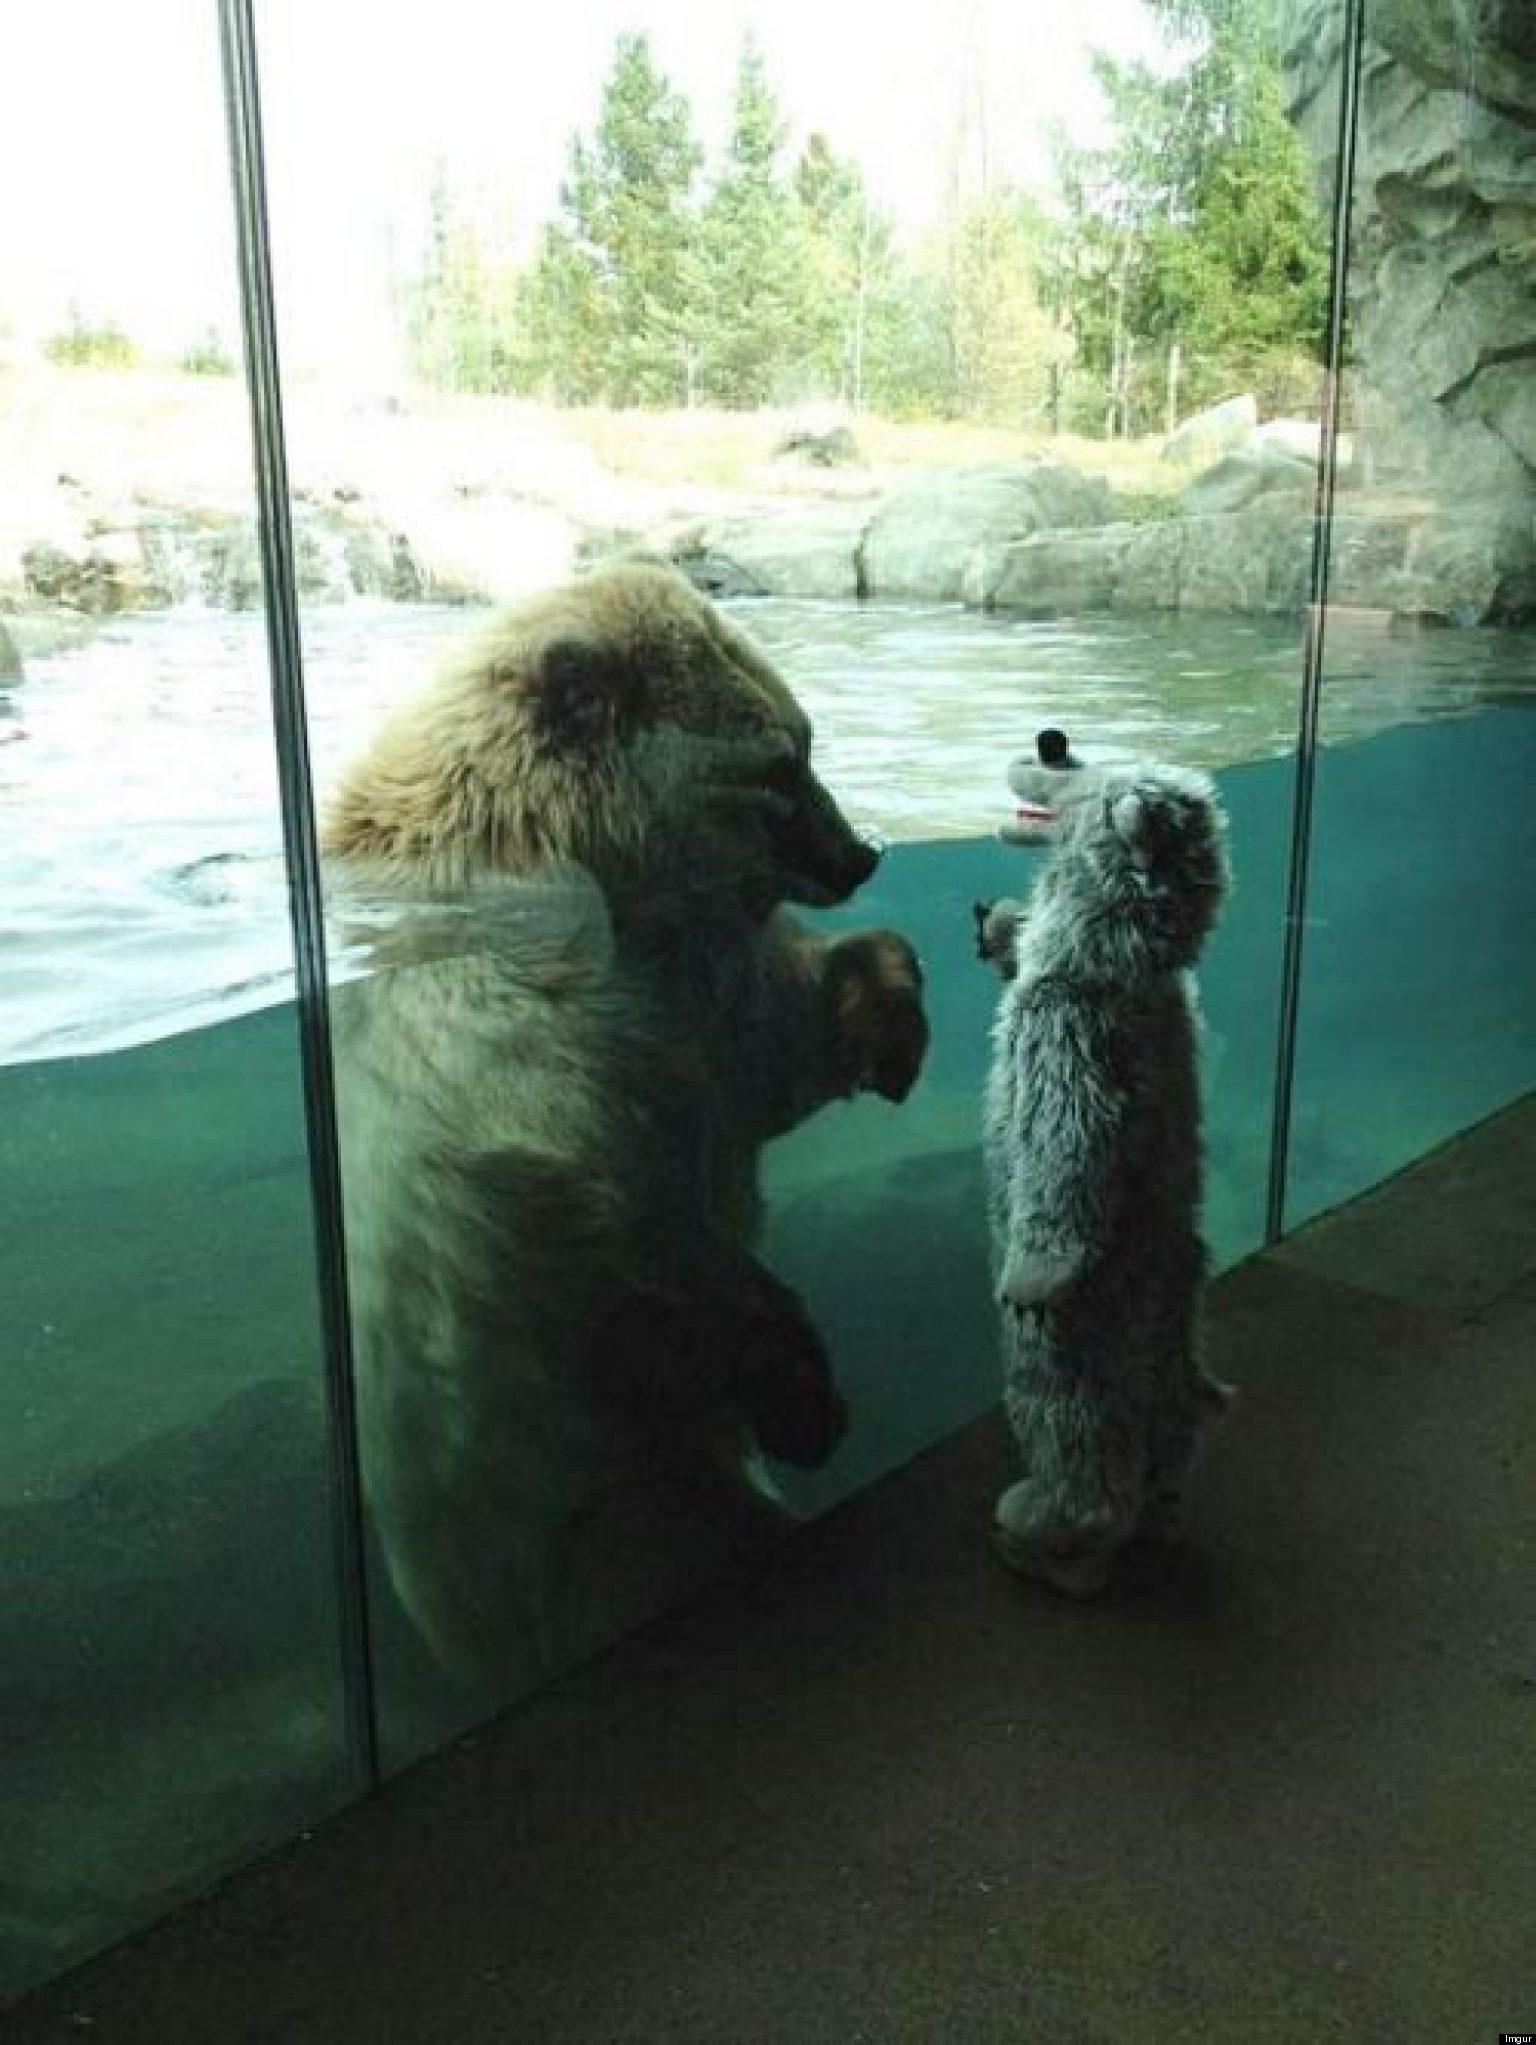 Bear Meets Kid Wearing Bear Costume At The Minnesota Zoo (PHOTO)   HuffPost & Bear Meets Kid Wearing Bear Costume At The Minnesota Zoo (PHOTO ...